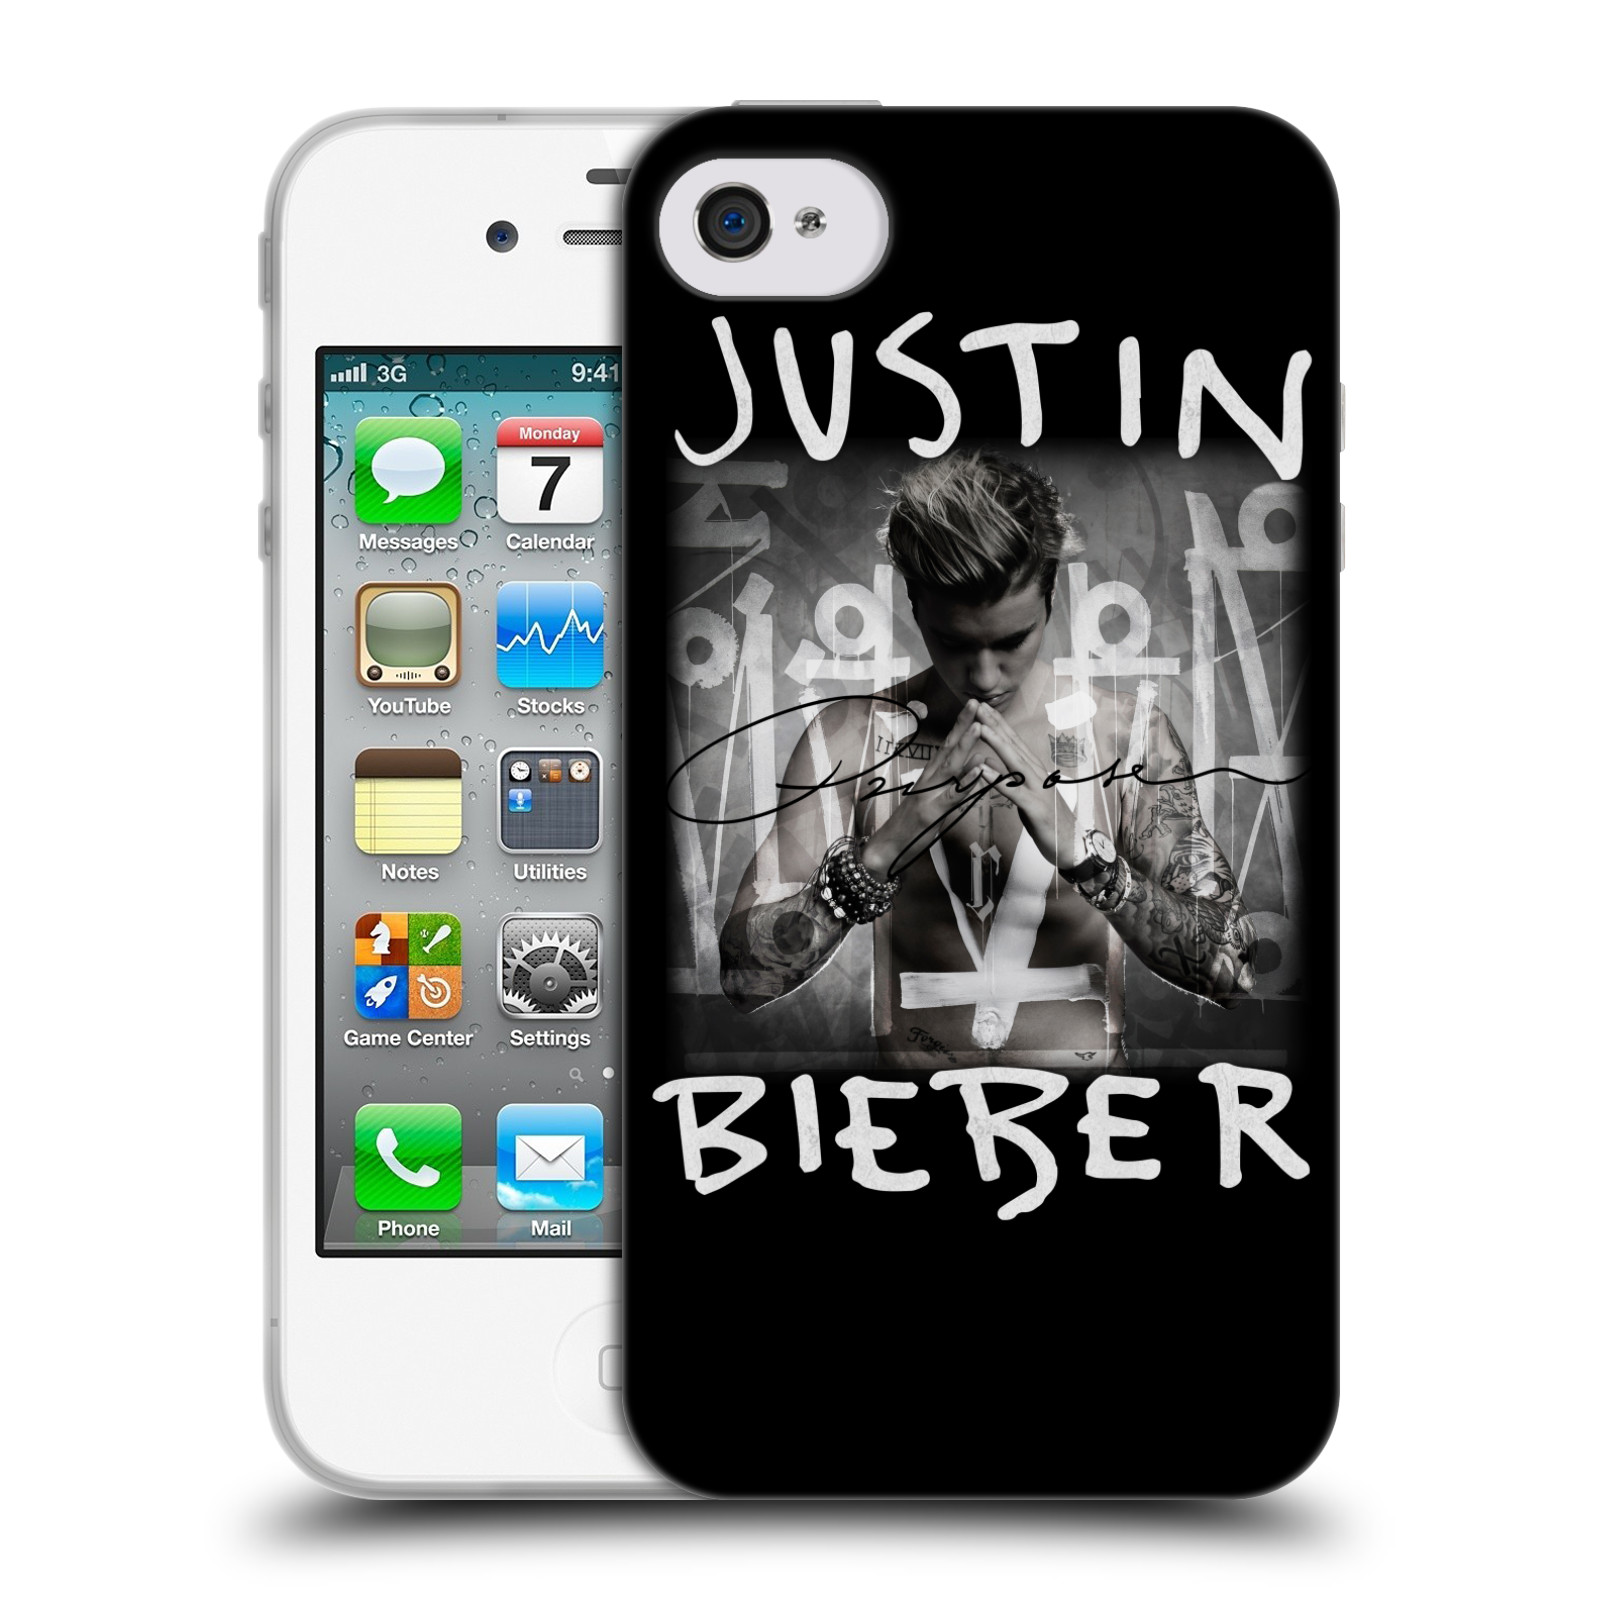 HEAD CASE silikonový obal na mobil Apple Iphone 4 / 4S originální potisk Justin Bieber Purpose